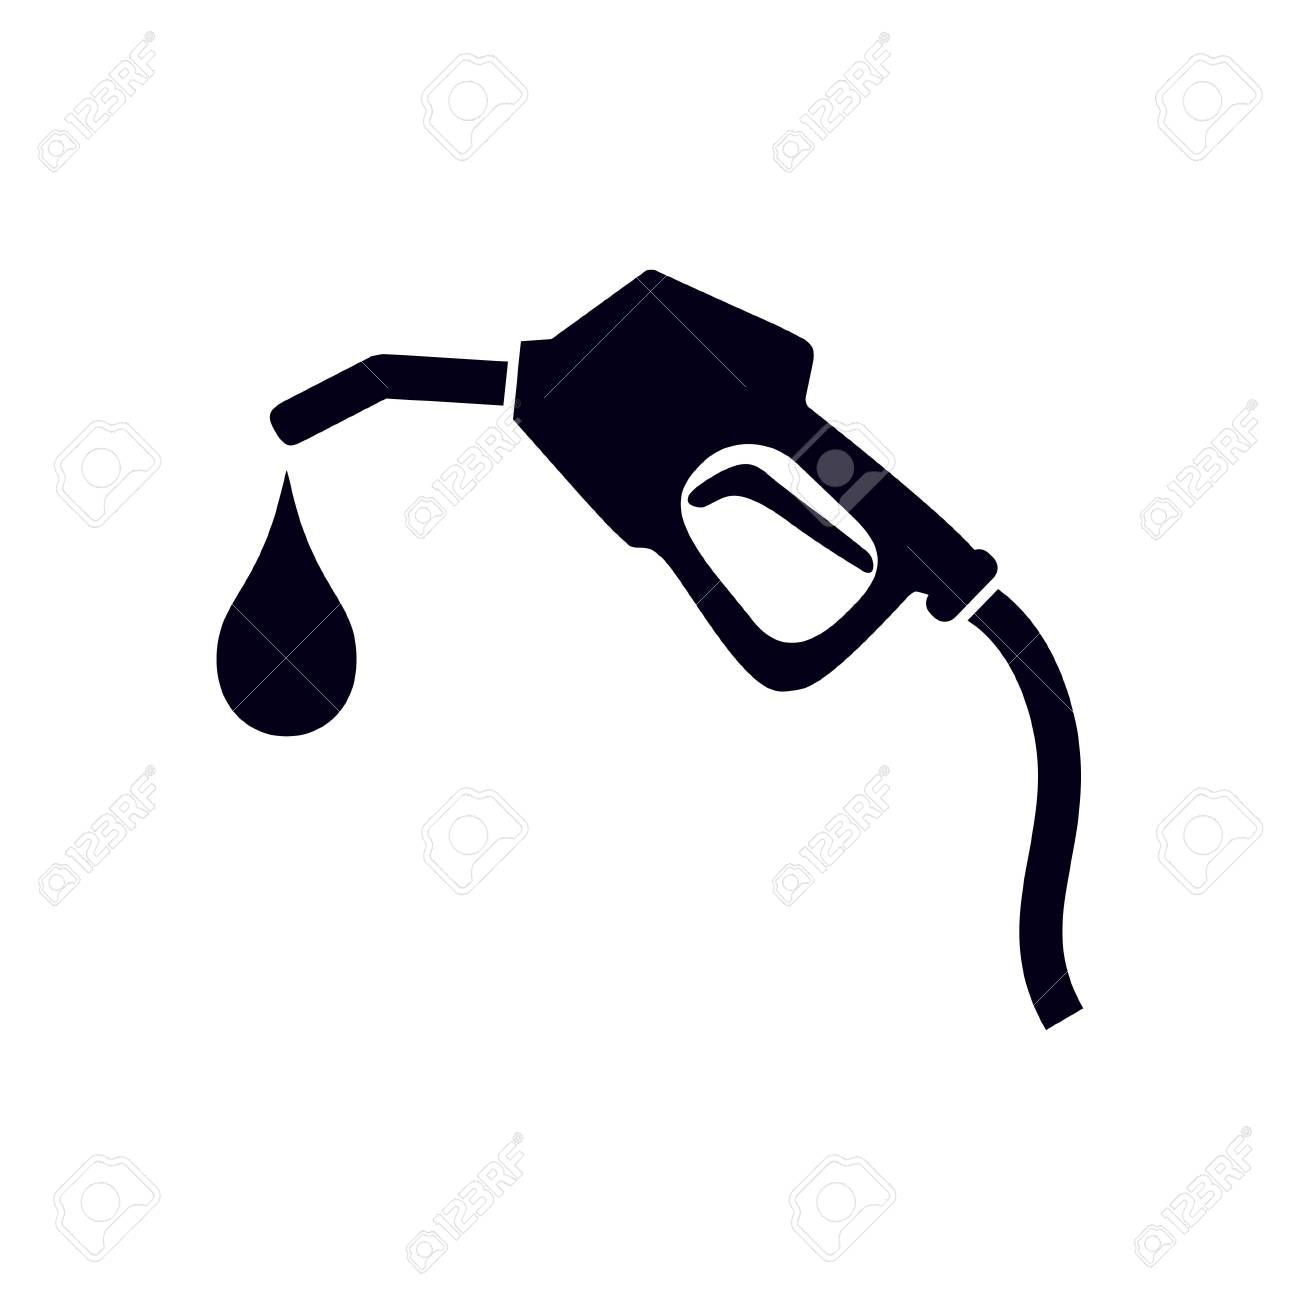 Gasoline pump nozzle sign.Gas station icon. Flat design style..